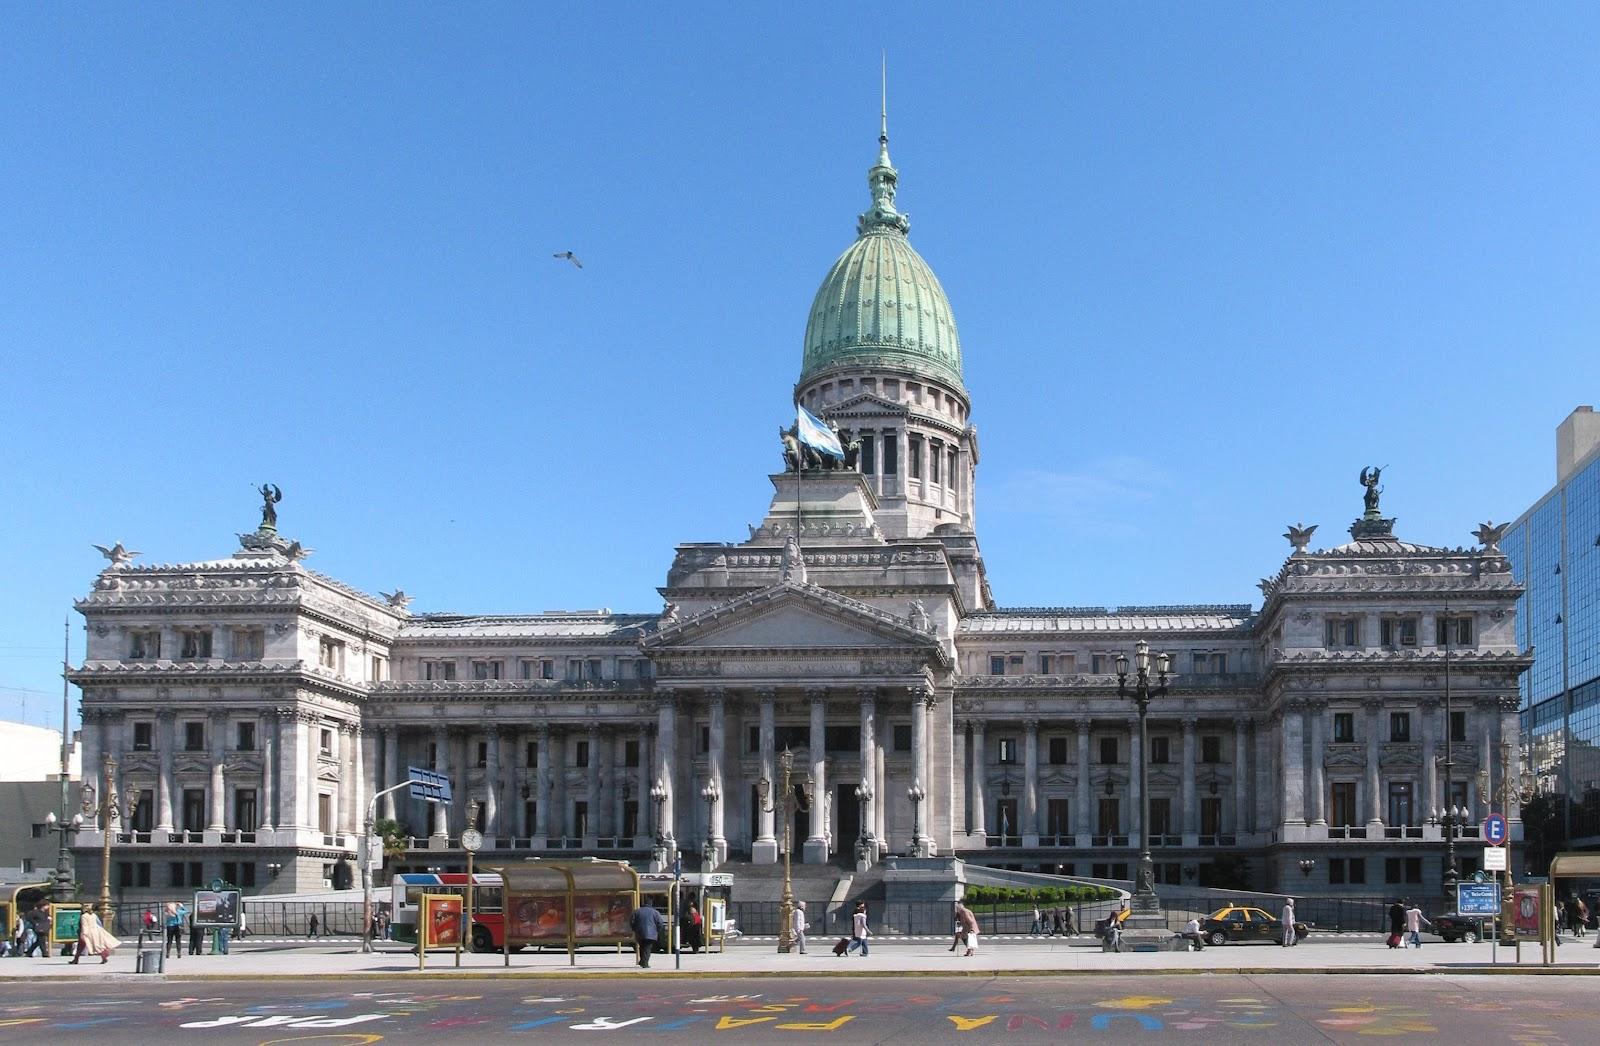 http://4.bp.blogspot.com/-3k0ErHdPucw/UGBHik46DzI/AAAAAAABRQ0/uqvL-M7Z2f8/s1600/Congreso-Nacional-Buenos-Aires-Argentina-Wallpaper.jpg